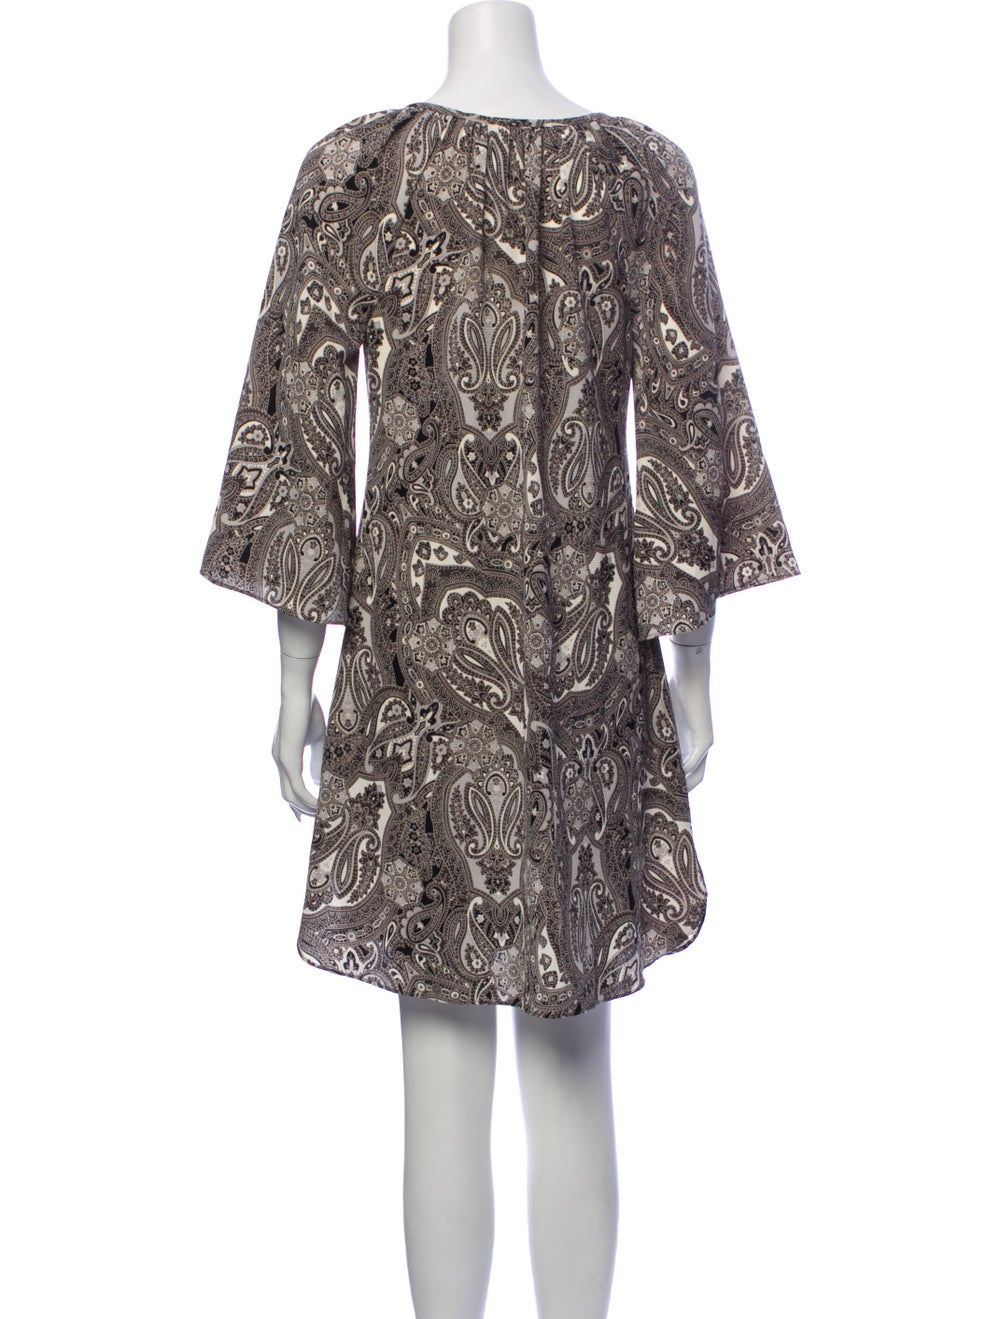 Rachel Zoe Paisley Print Mini Dress Grey - image 3